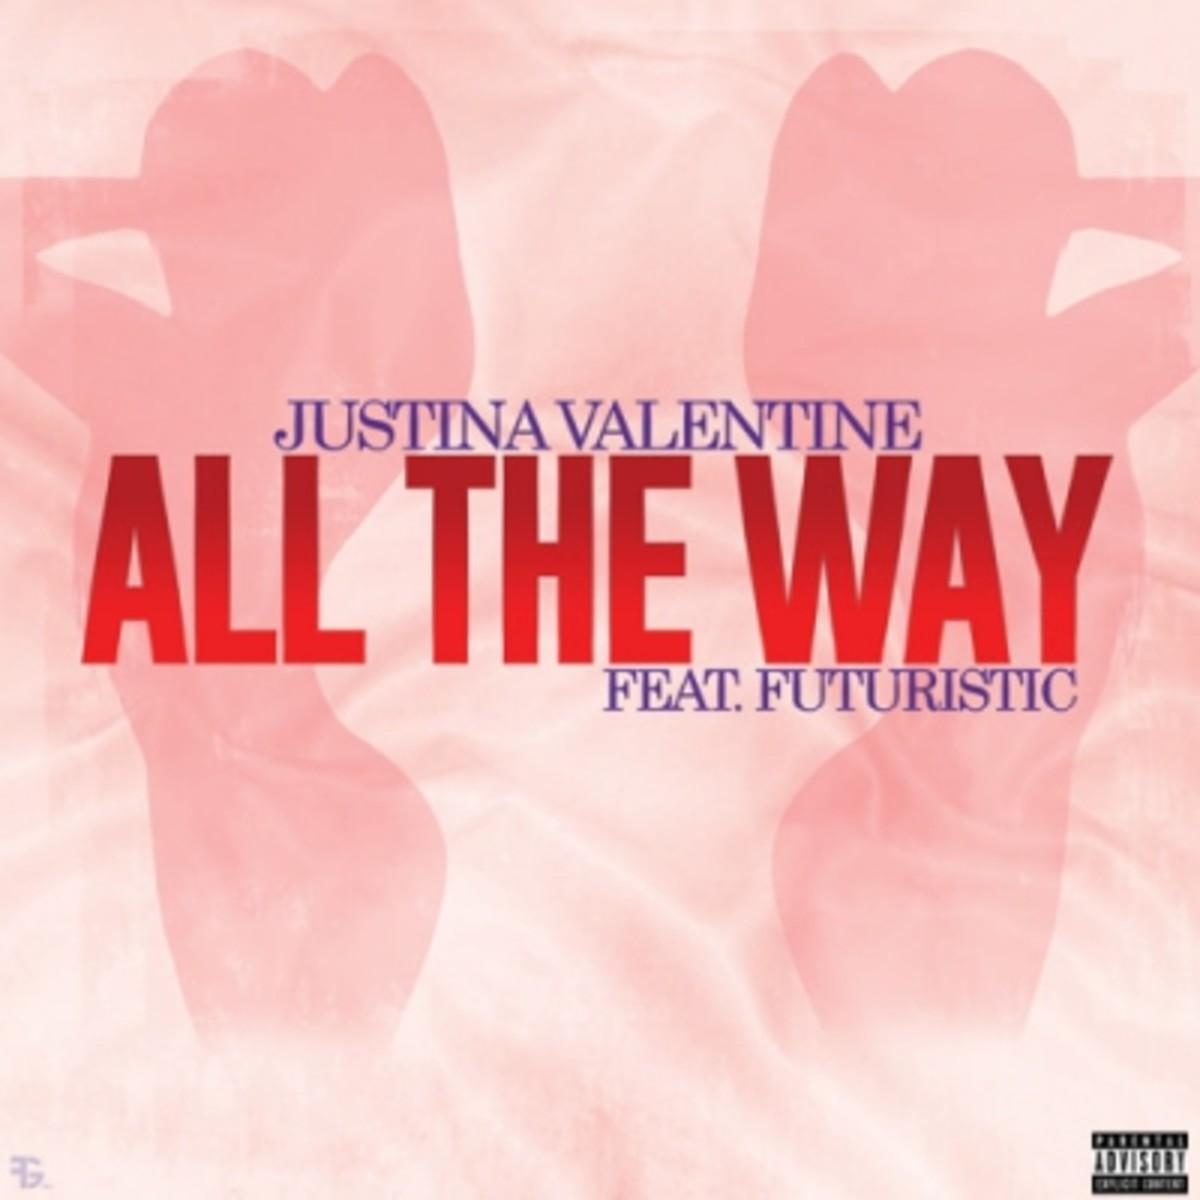 justina-valentine-all-the-way.jpg